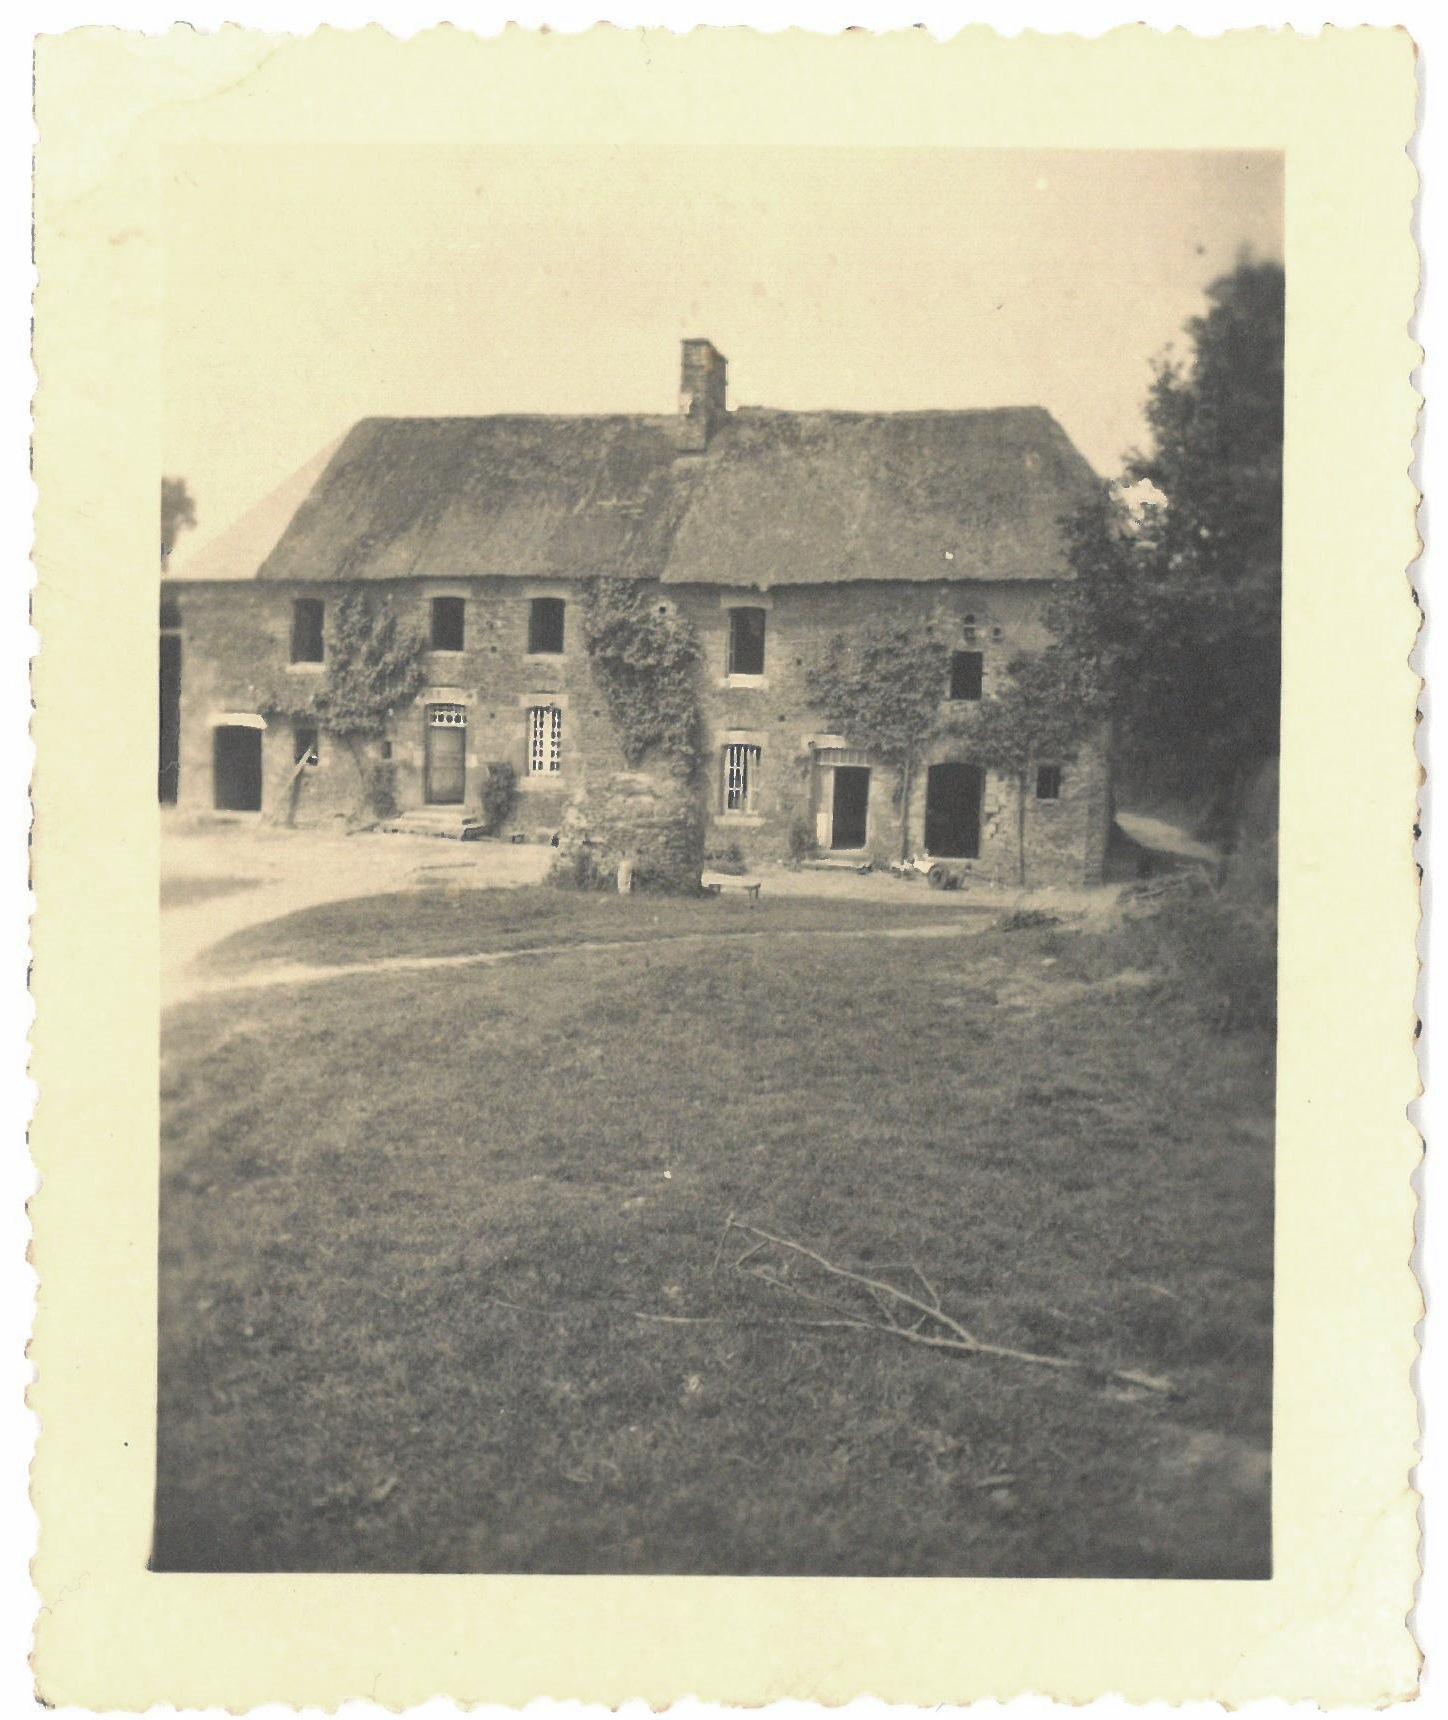 near St Lo 1944 Normandy